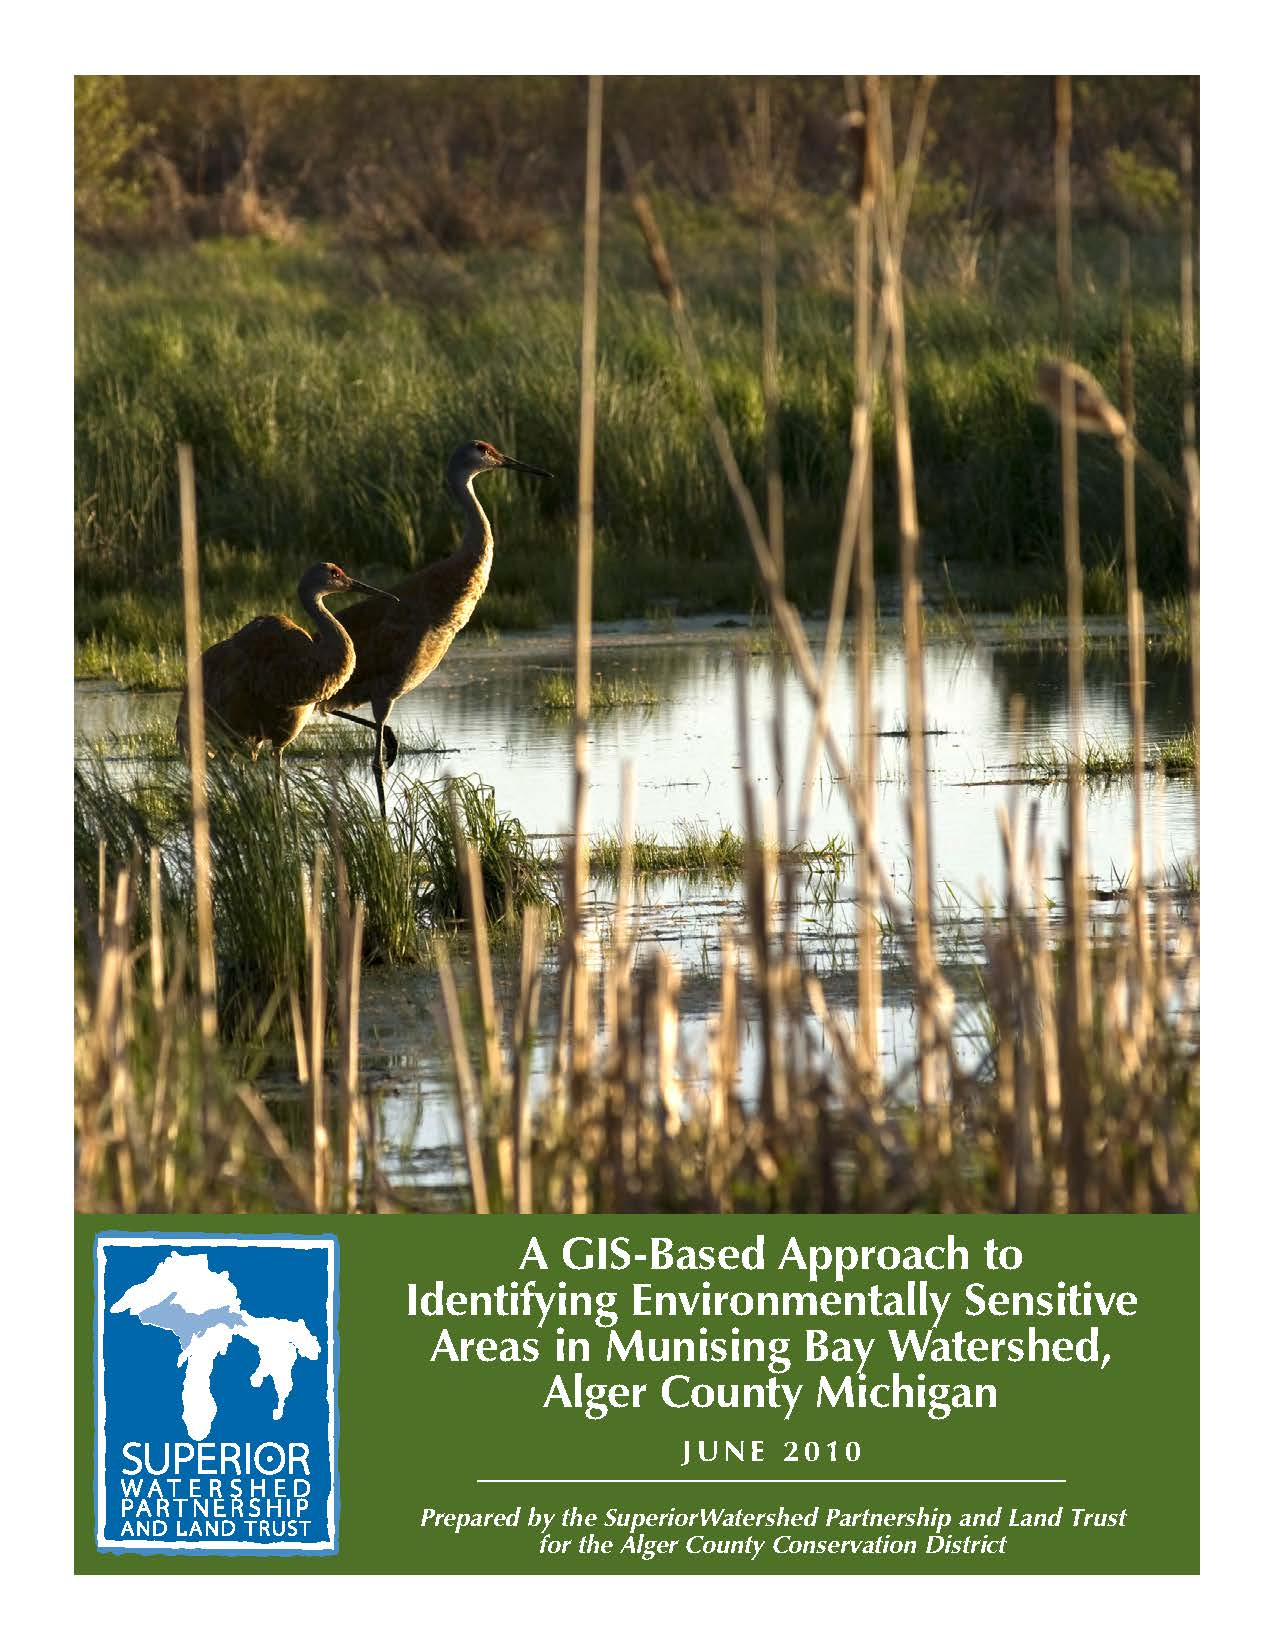 Michigan alger county munising - Munising Bay Final Report Cover